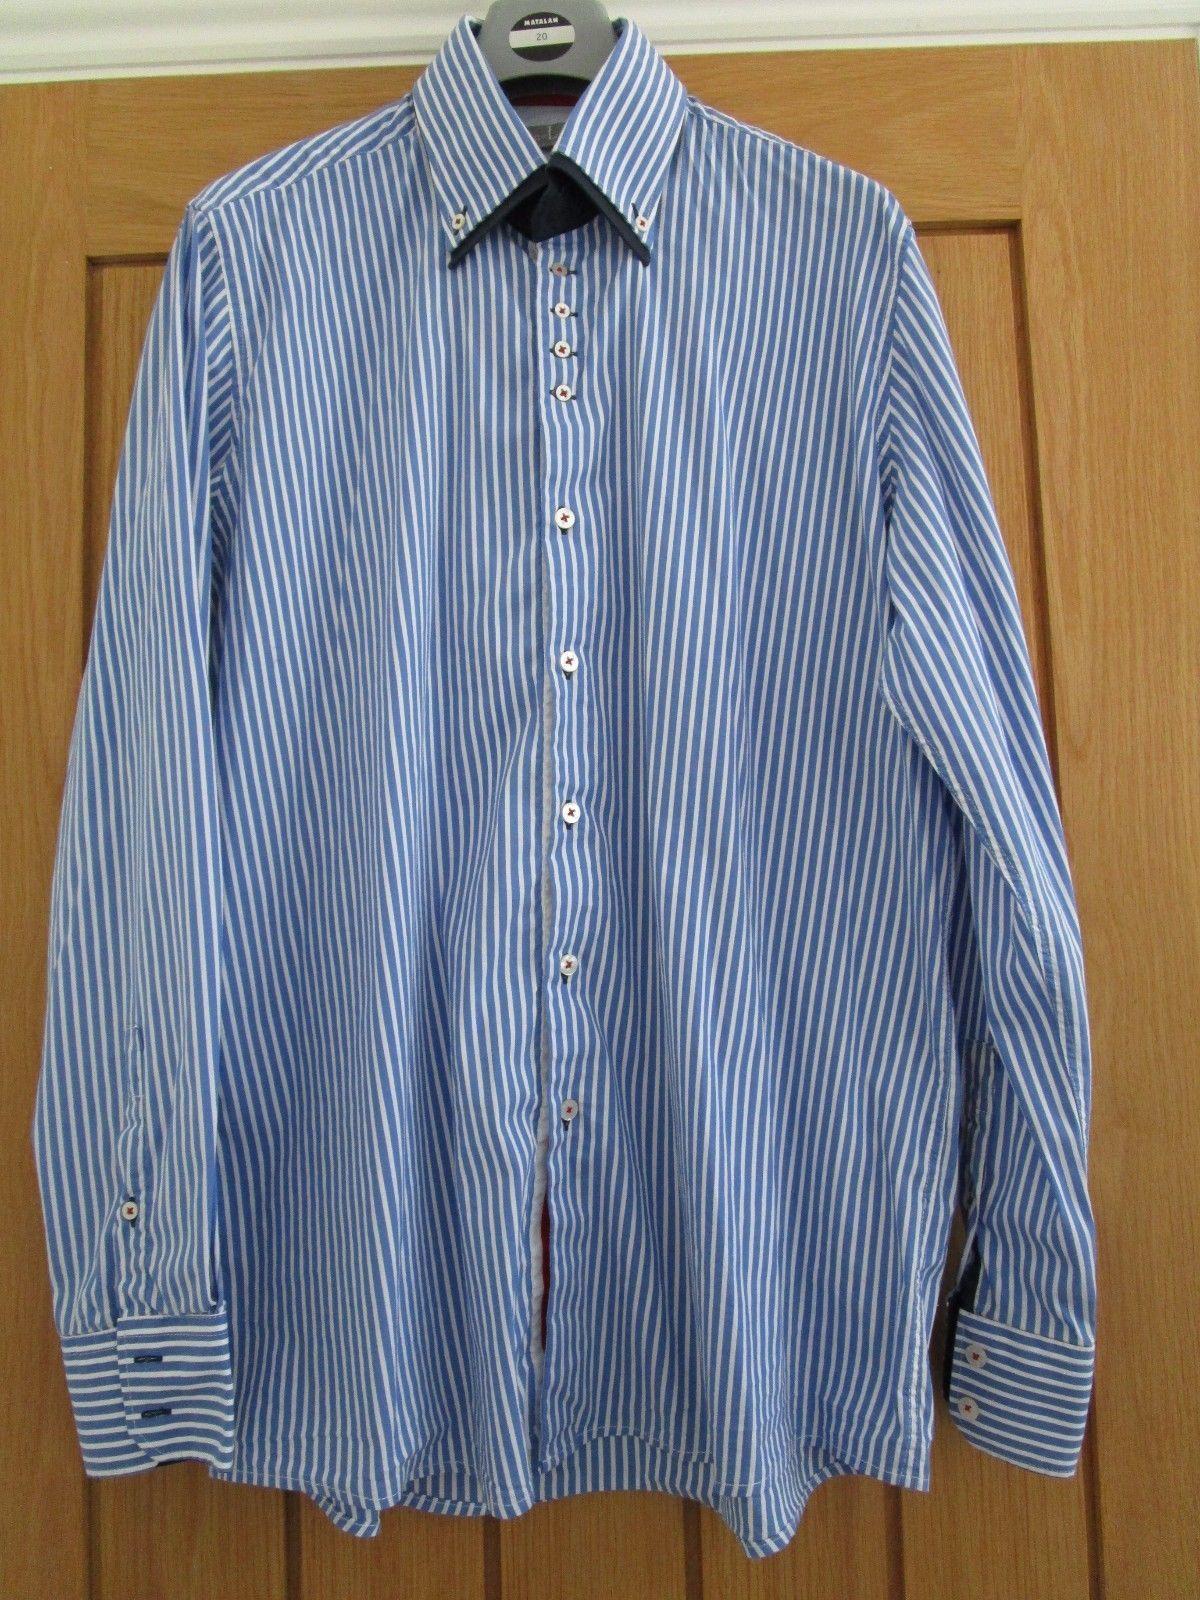 LAURA ASHLEY MEN'S SHIRT BLUE & WHITE STRIPE SIZE XL WORN ONCE | eBay